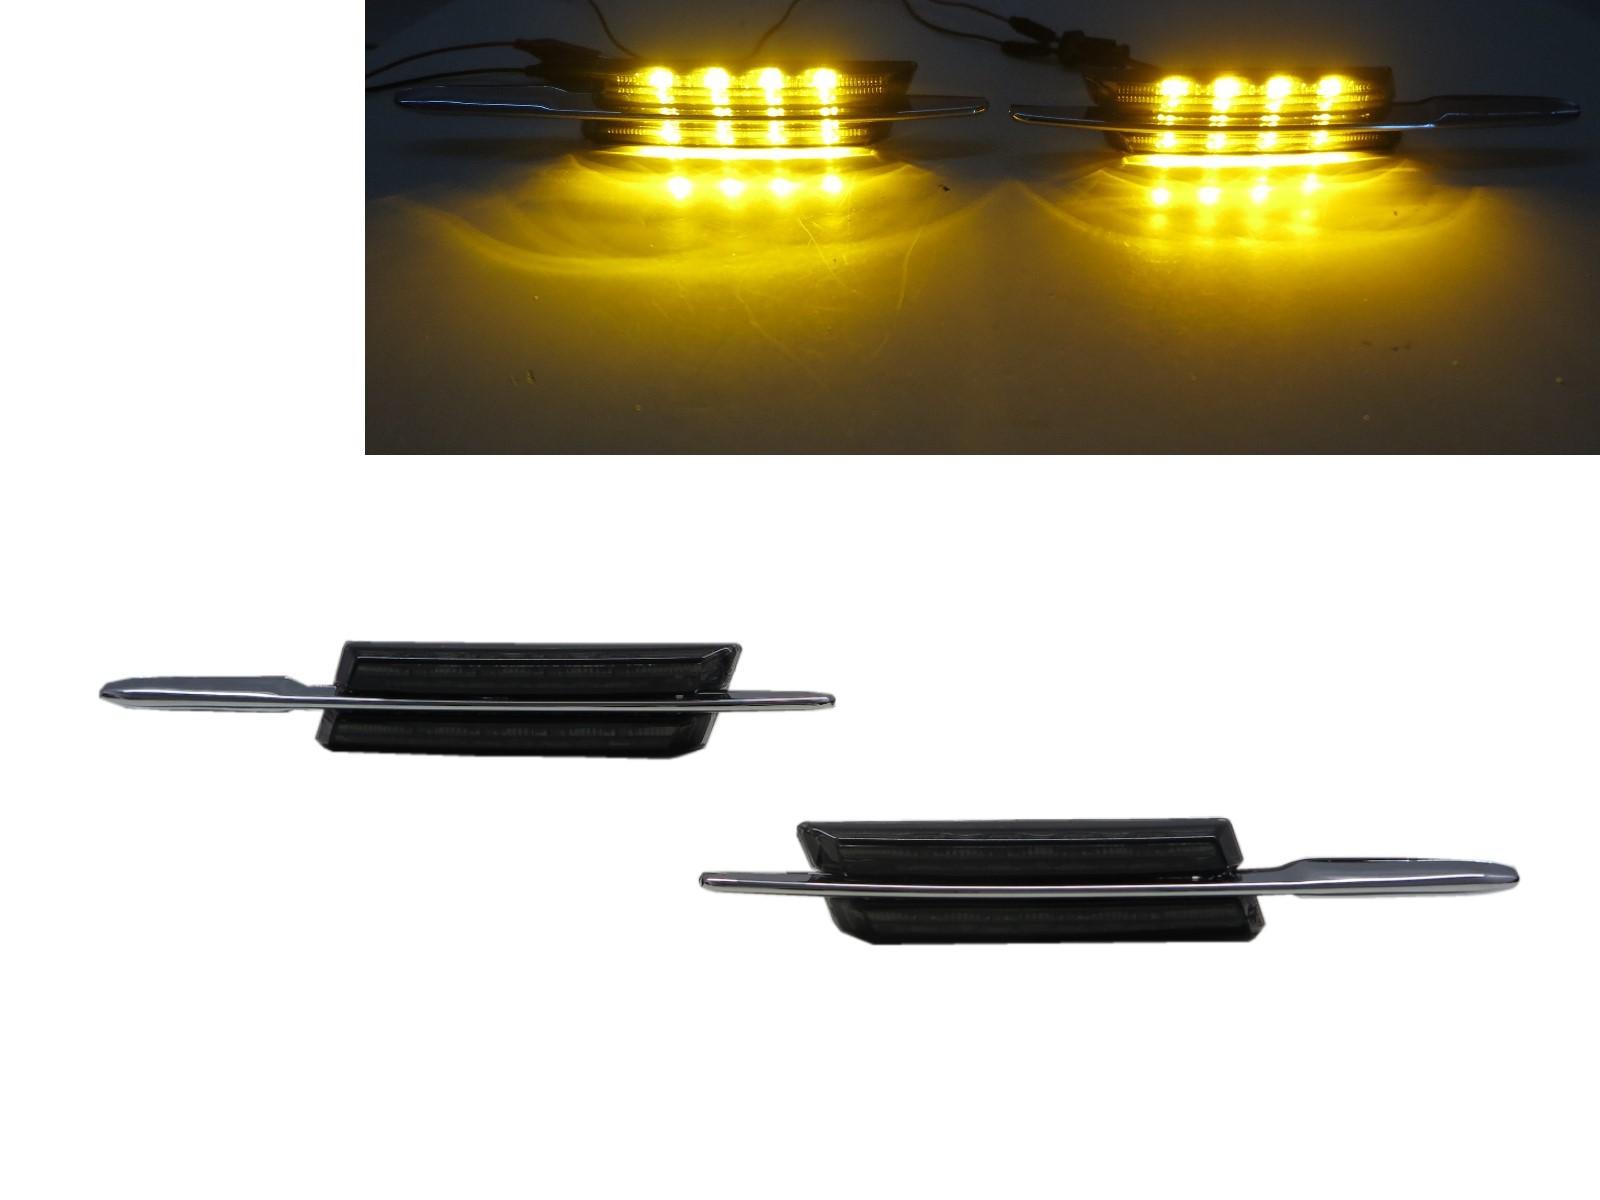 CrazyTheGod 3-Series E90/E91/E92/E93 Fifth generation 2004-2013 Sedan/Wagon/Coupe/Convertible 2D/4D/5D LED Side Marker Light Lamp Smoke for BMW